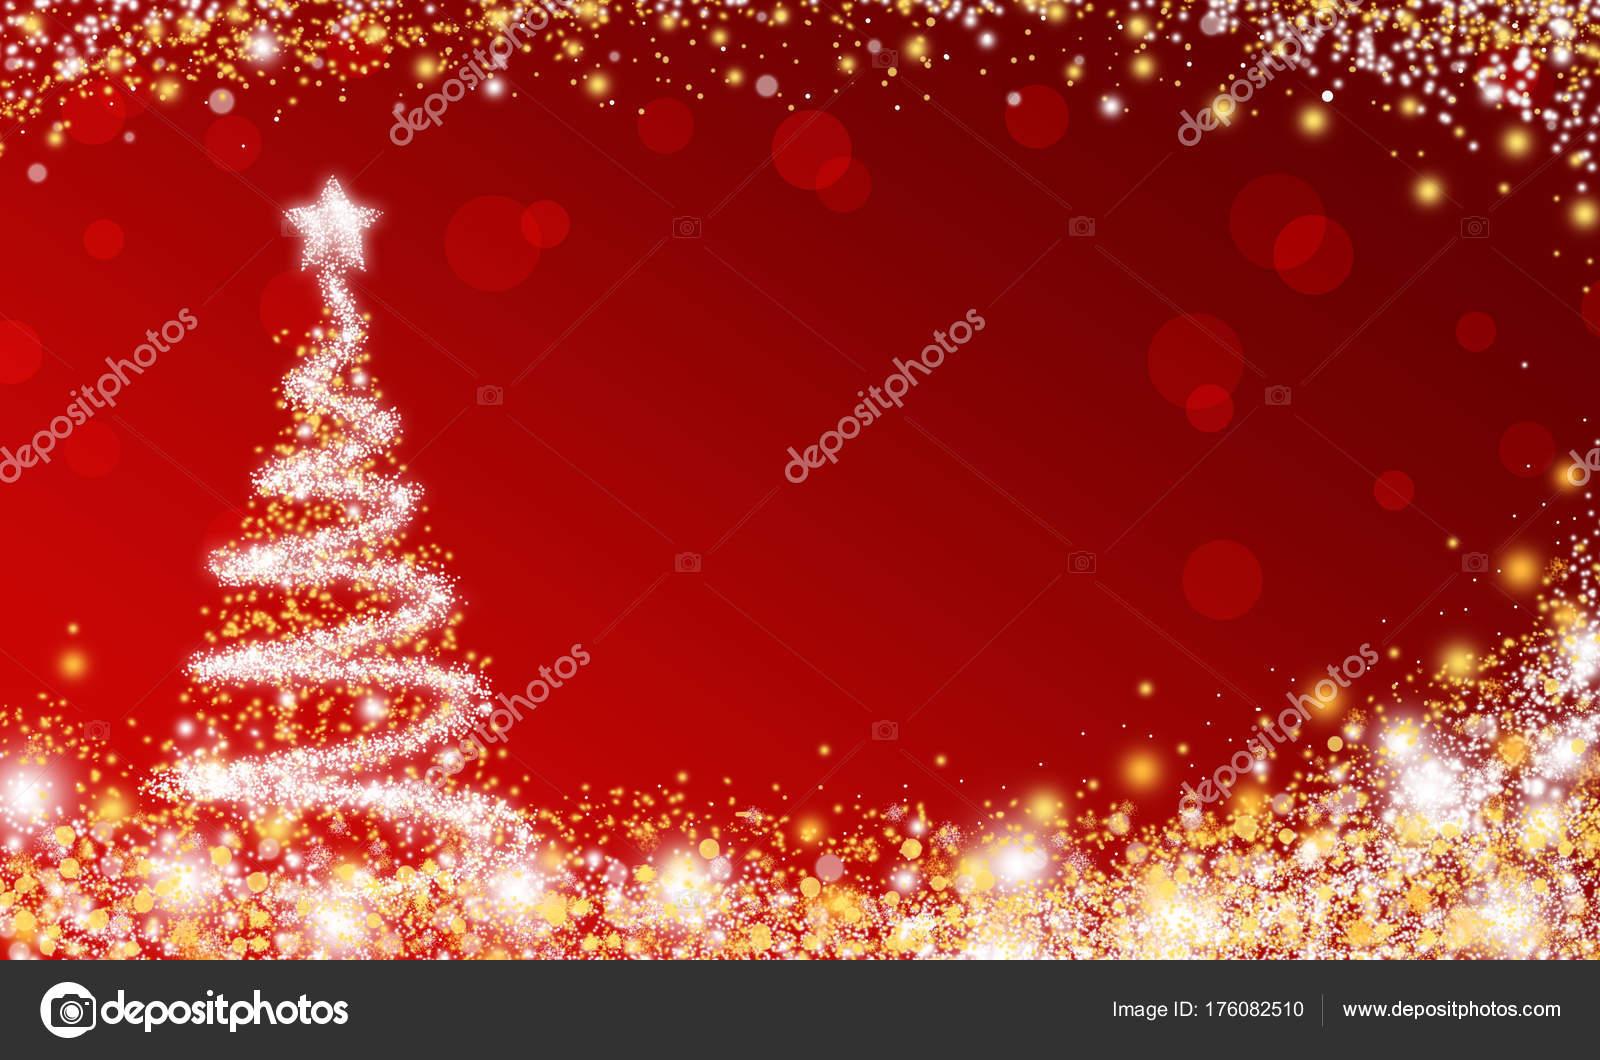 Christmas Wallpaper Tree Red Christmas Wallpaper Sparkle Christmas Tree Stock Photo C Hendraxu 176082510